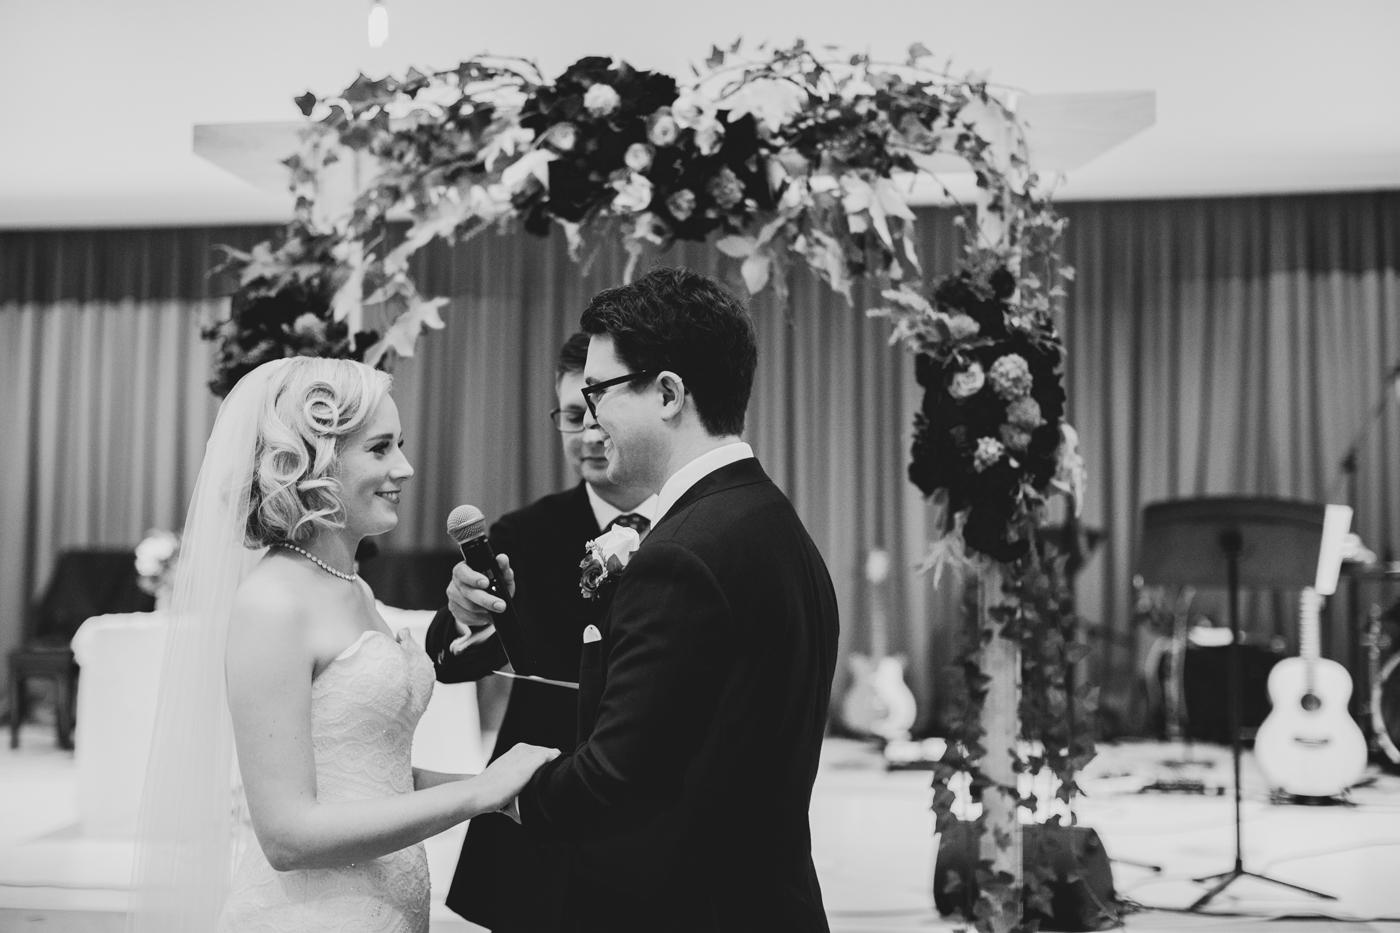 Jo & Tom Wedding - The Grounds of Alexandria - Samantha Heather Photography-121.jpg